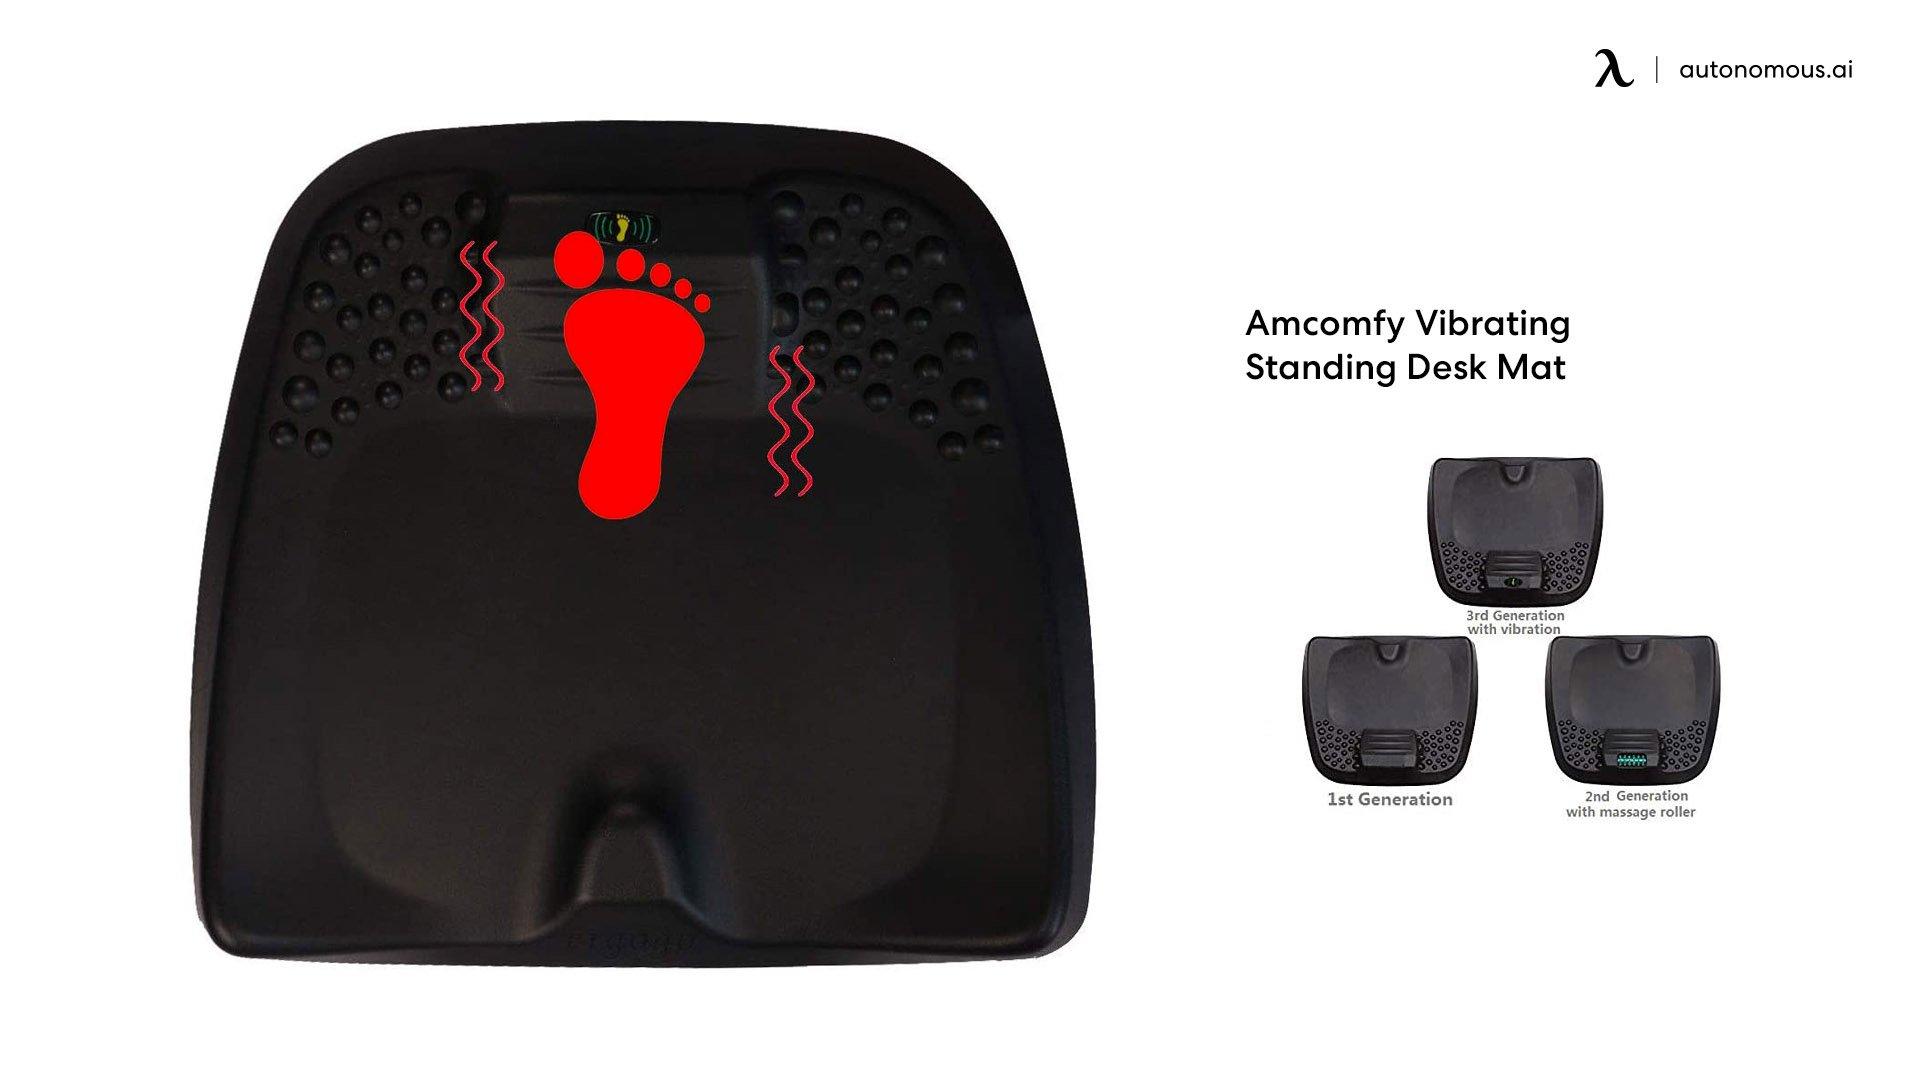 Amcomfy Vibrating Standing Desk Mat